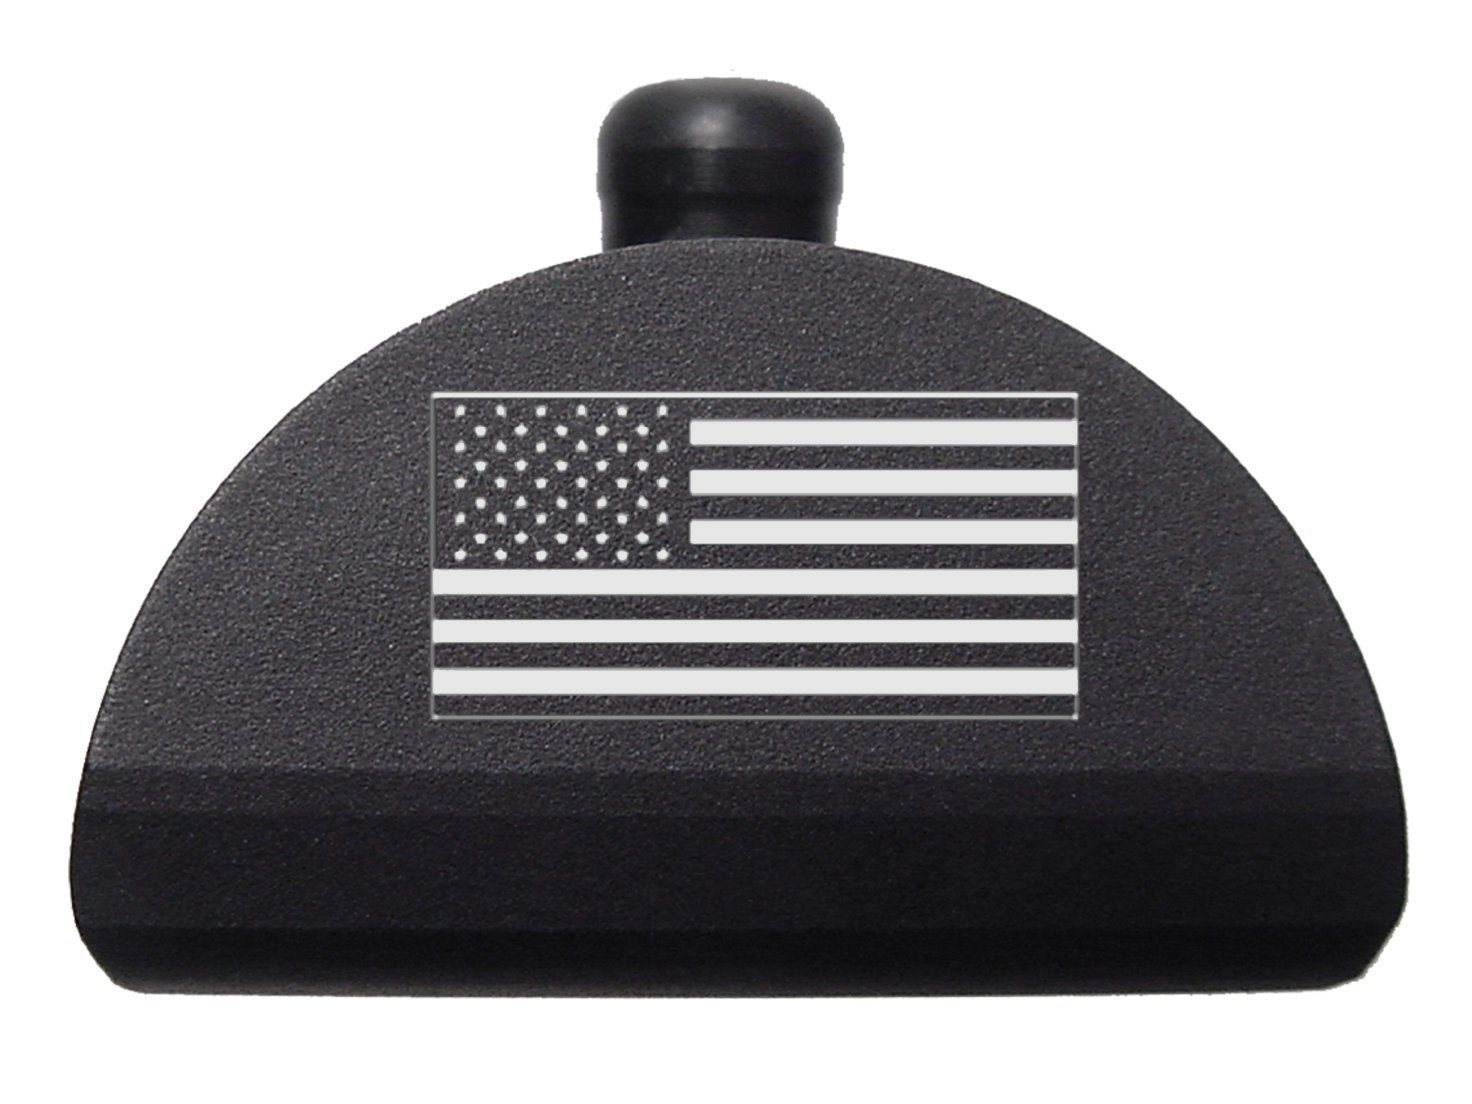 Fixxxer Aluminum Grip Frame Plug for Glock 17 19 22 23 24 31 32 34 35 37 38 GEN 1-3 (American Flag)